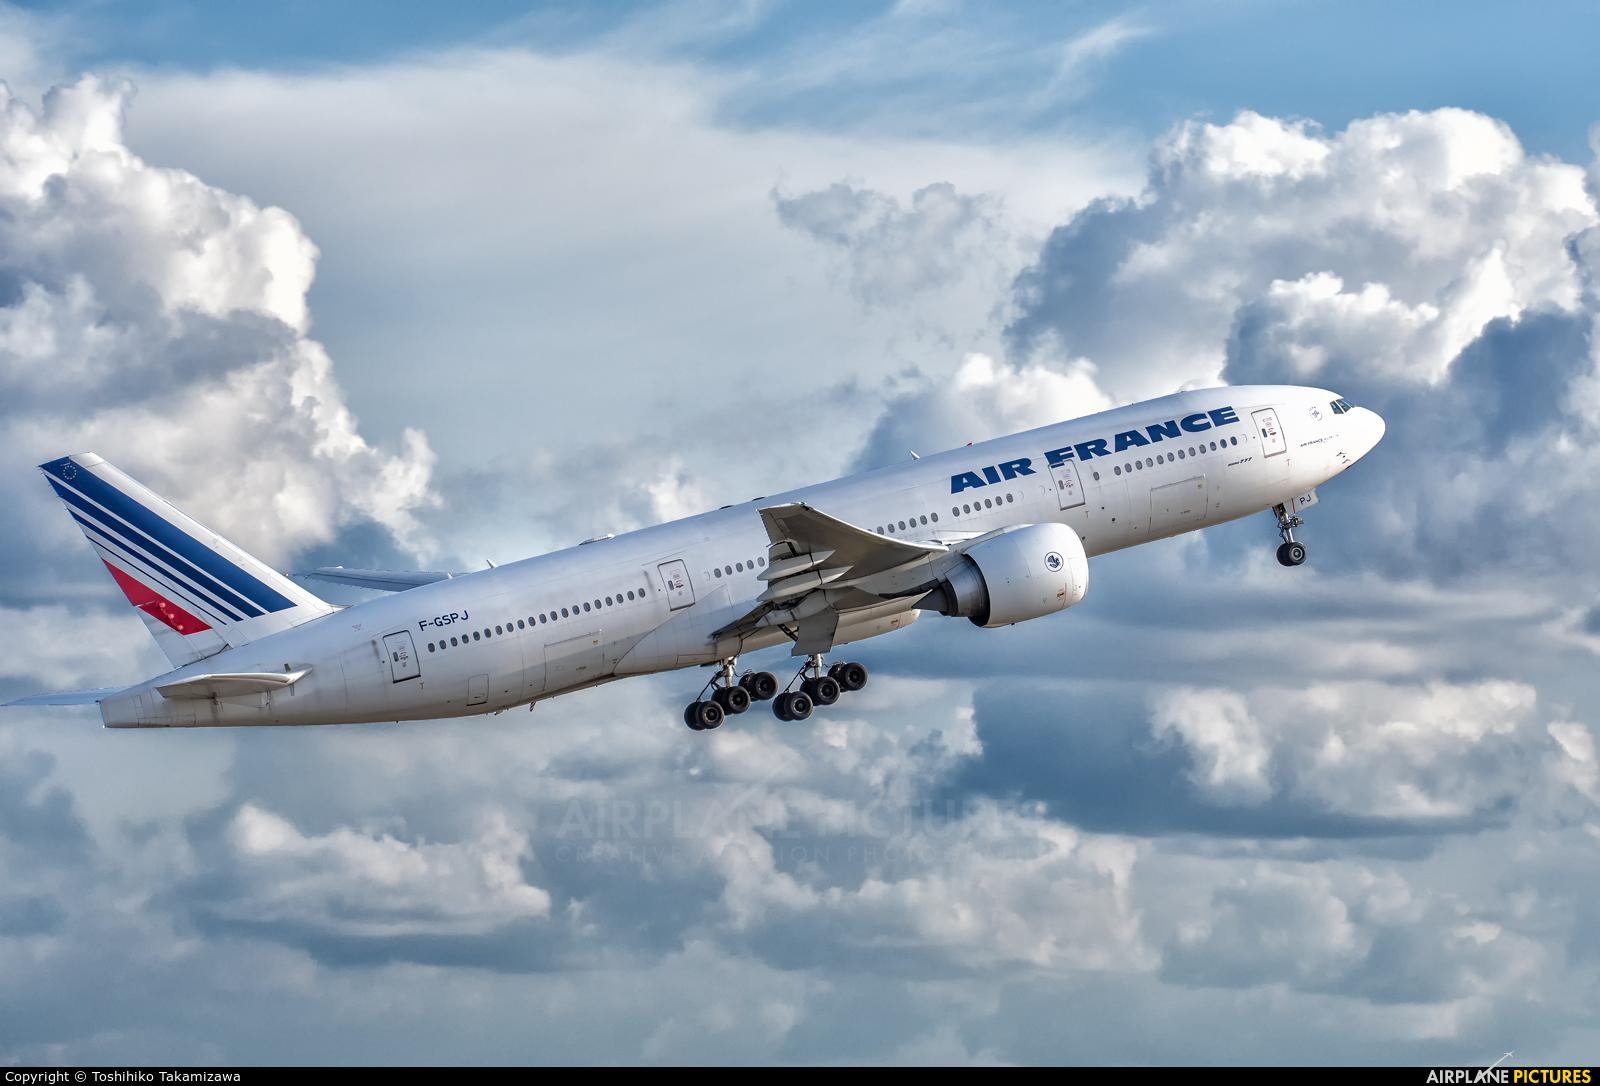 Air France F-GSPJ aircraft at Paris - Charles de Gaulle